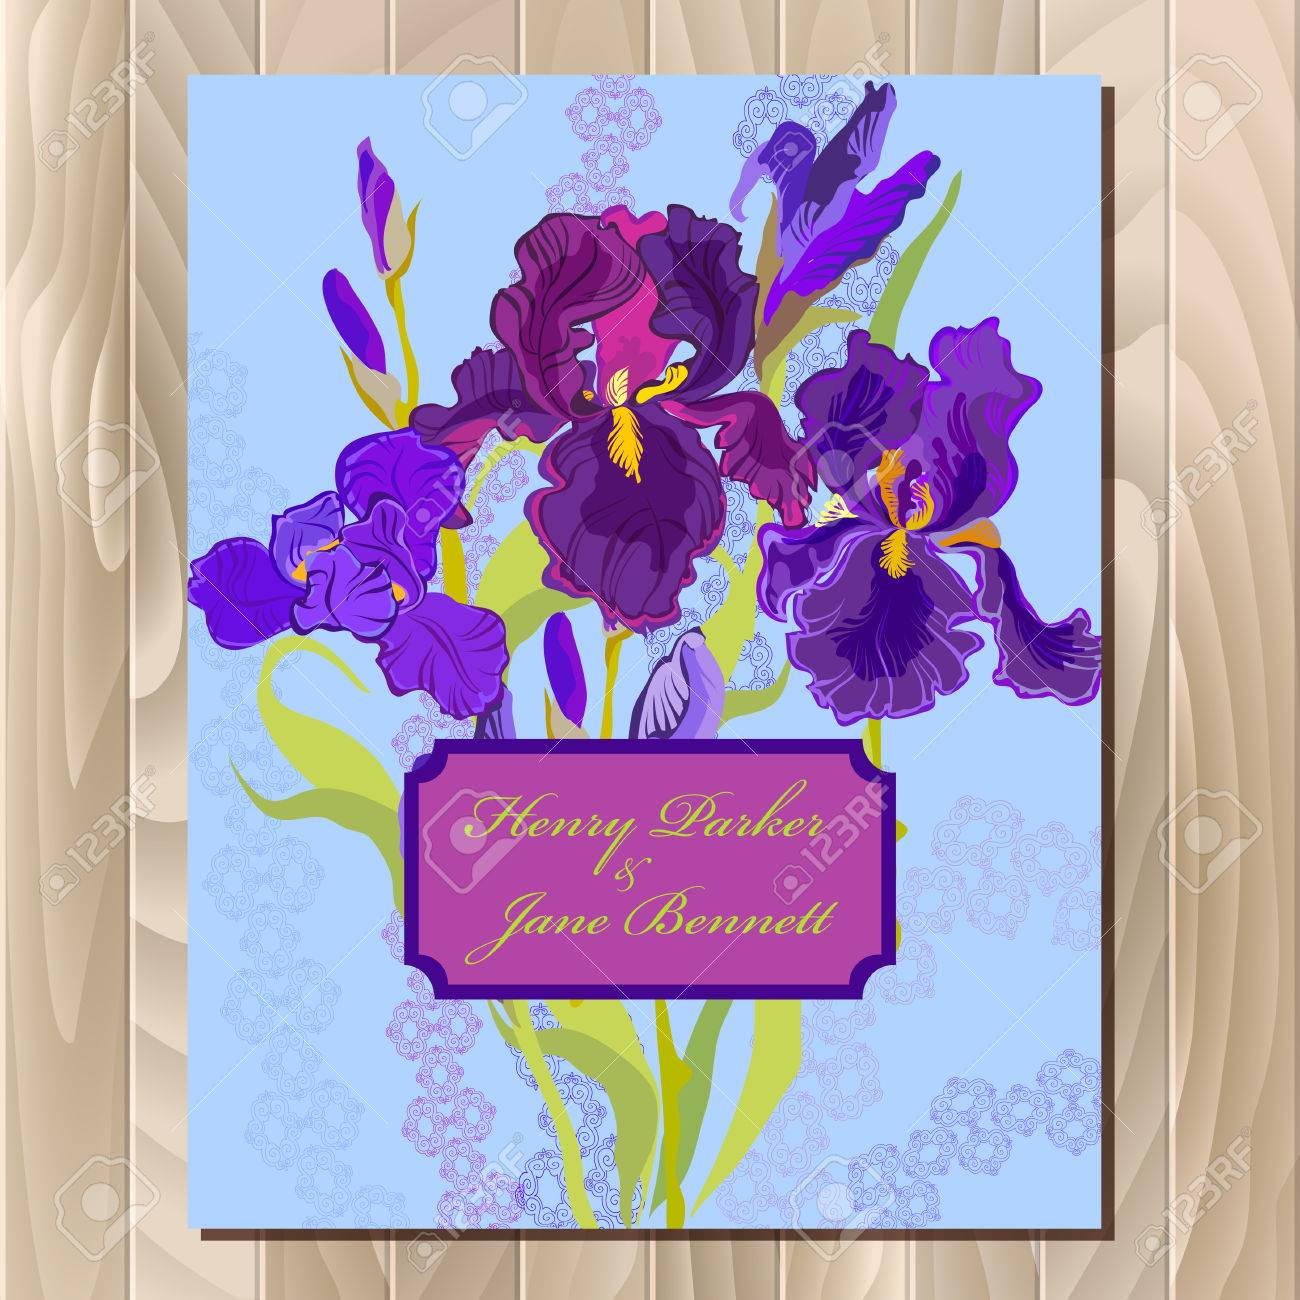 Wedding background with lilac violet purple iris flower background stock fot wedding background with lilac violet purple iris flower background iris bouquet illustration printable vertical design backgrounds set izmirmasajfo